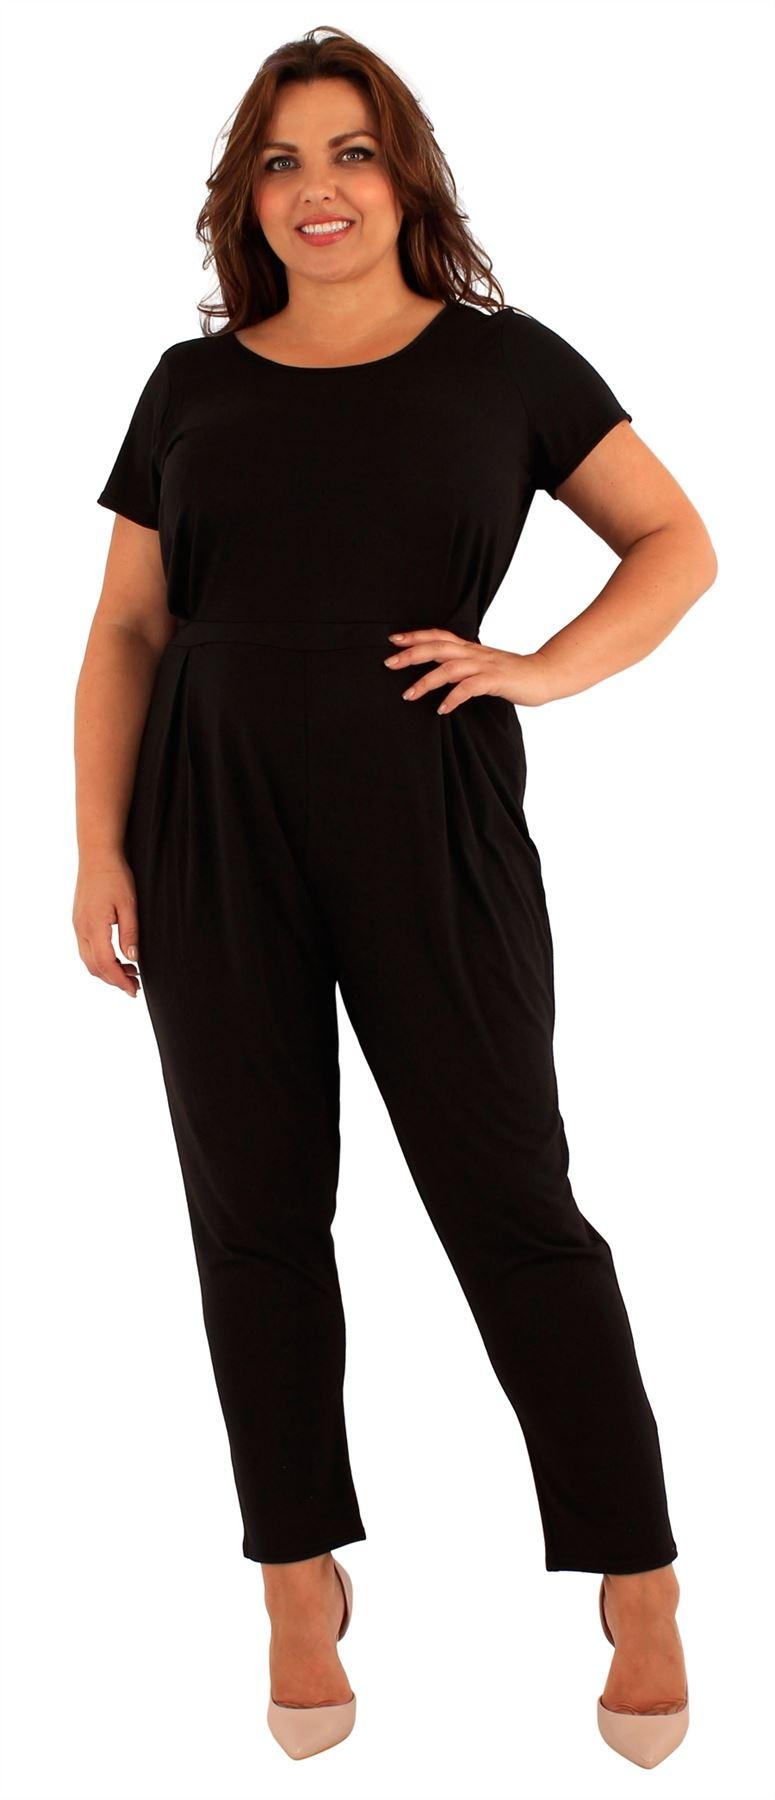 New Ladies Plus Size Cap Sleeve Black Jumpsuit Dress 18 24 Ebay